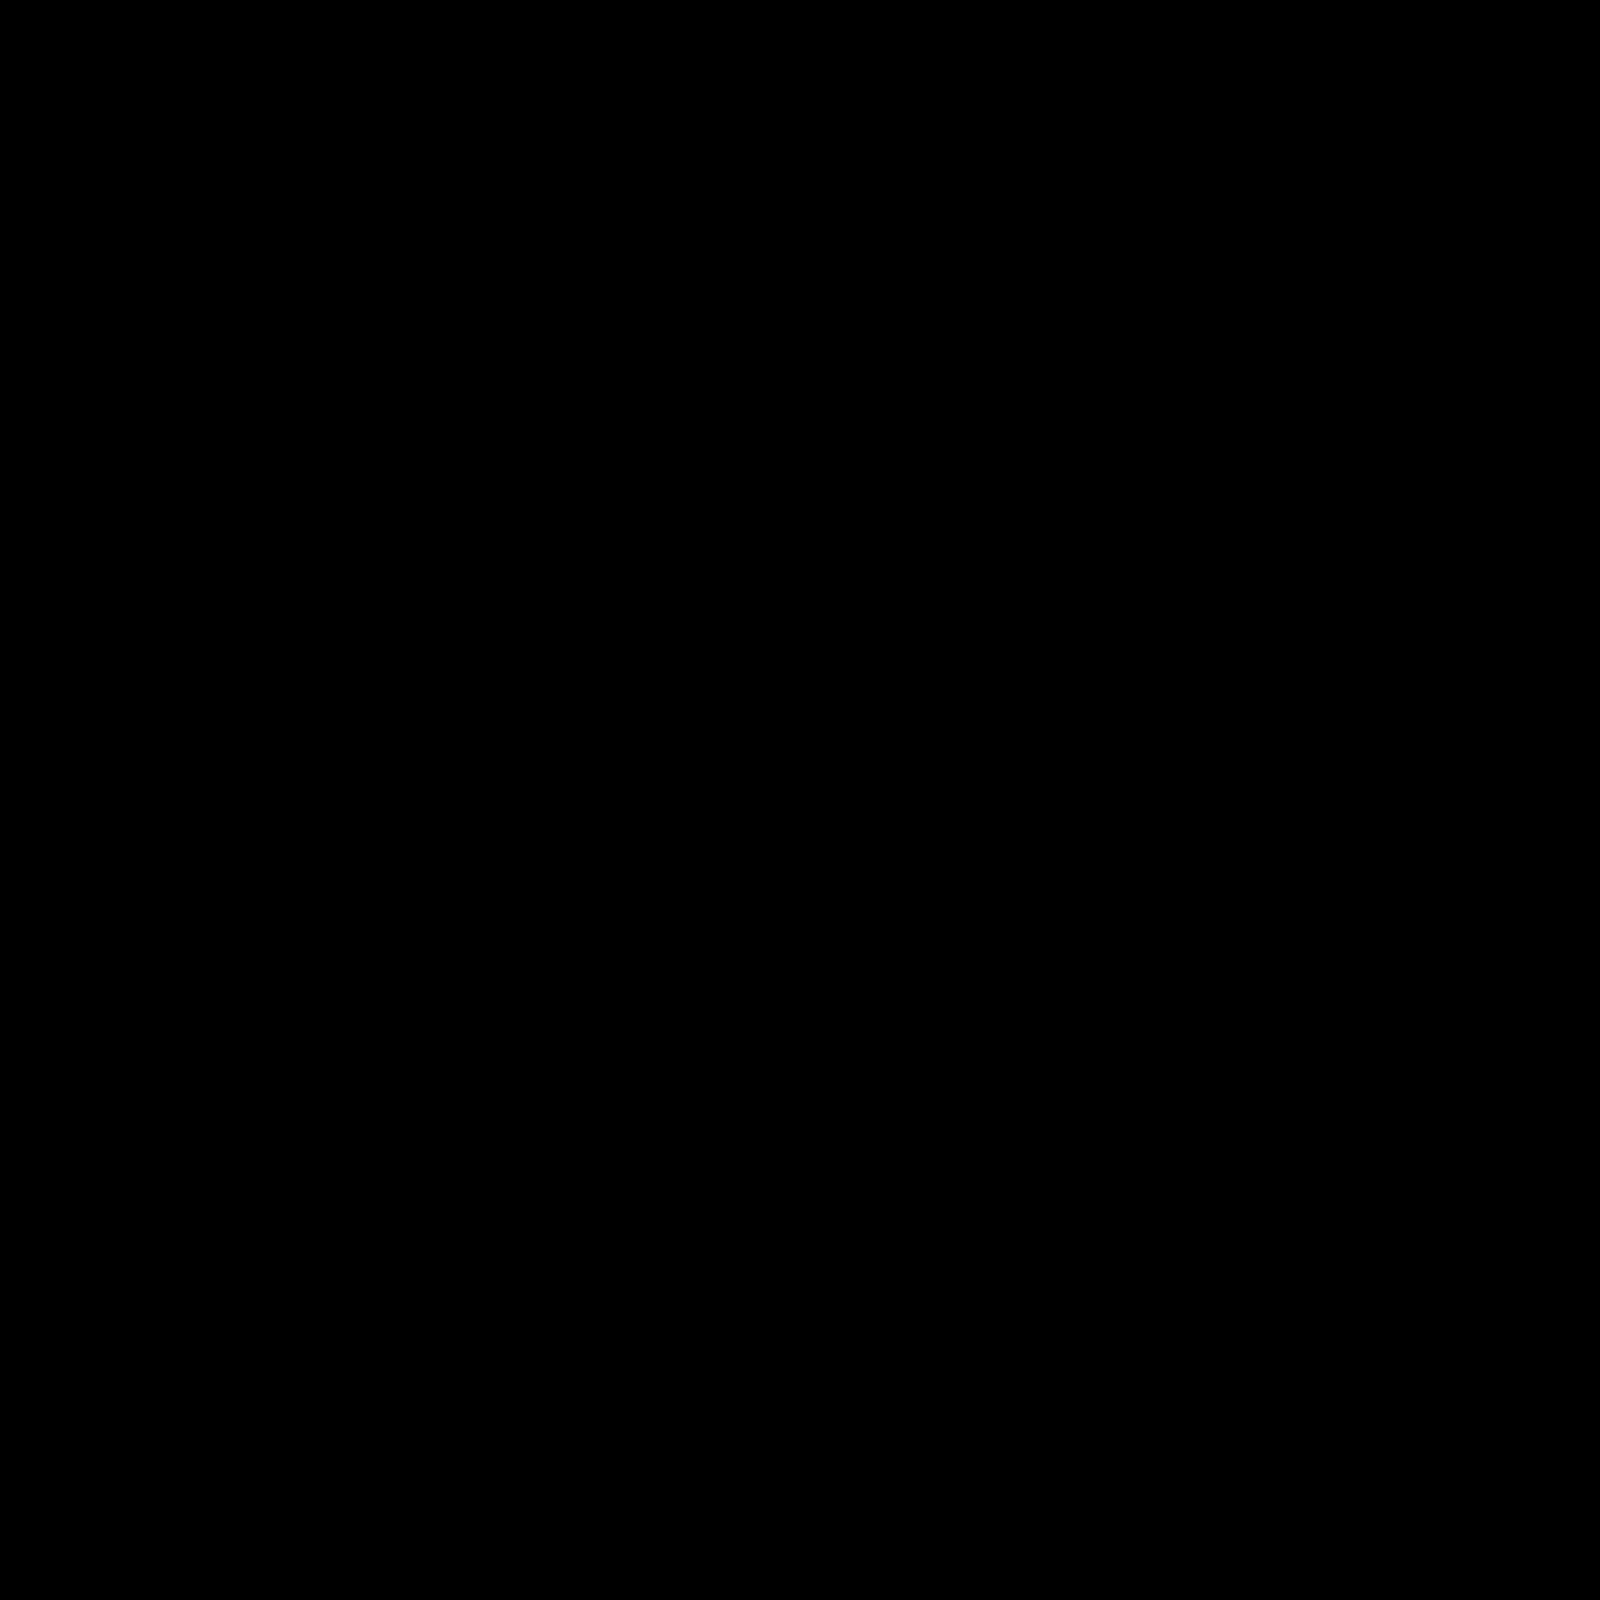 Digger icon